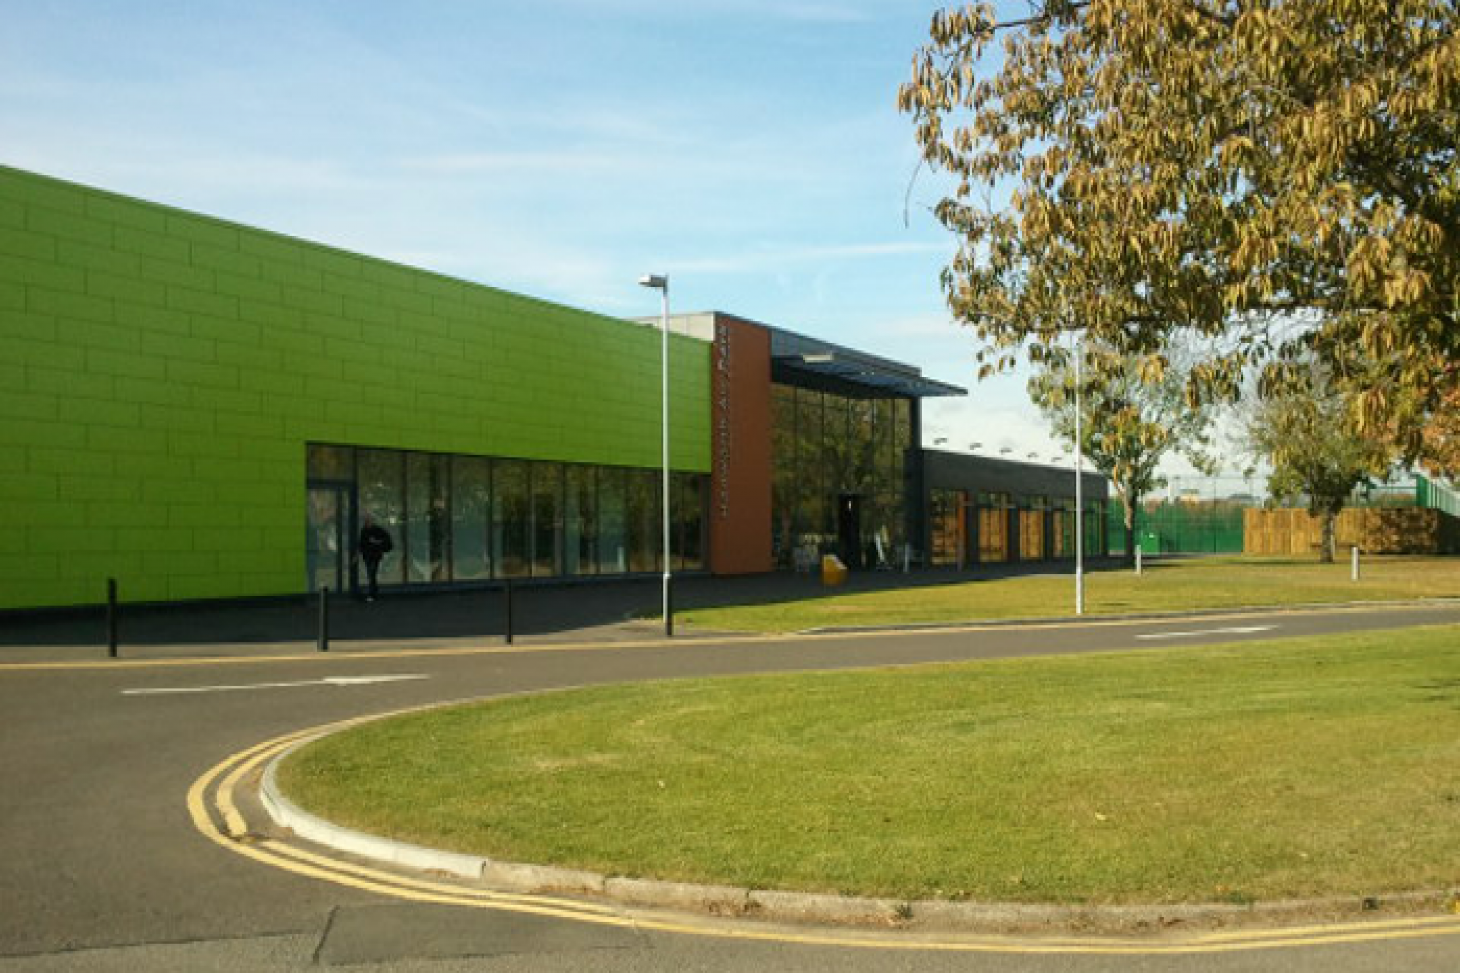 Hanworth Air Park Leisure Centre Gym gym